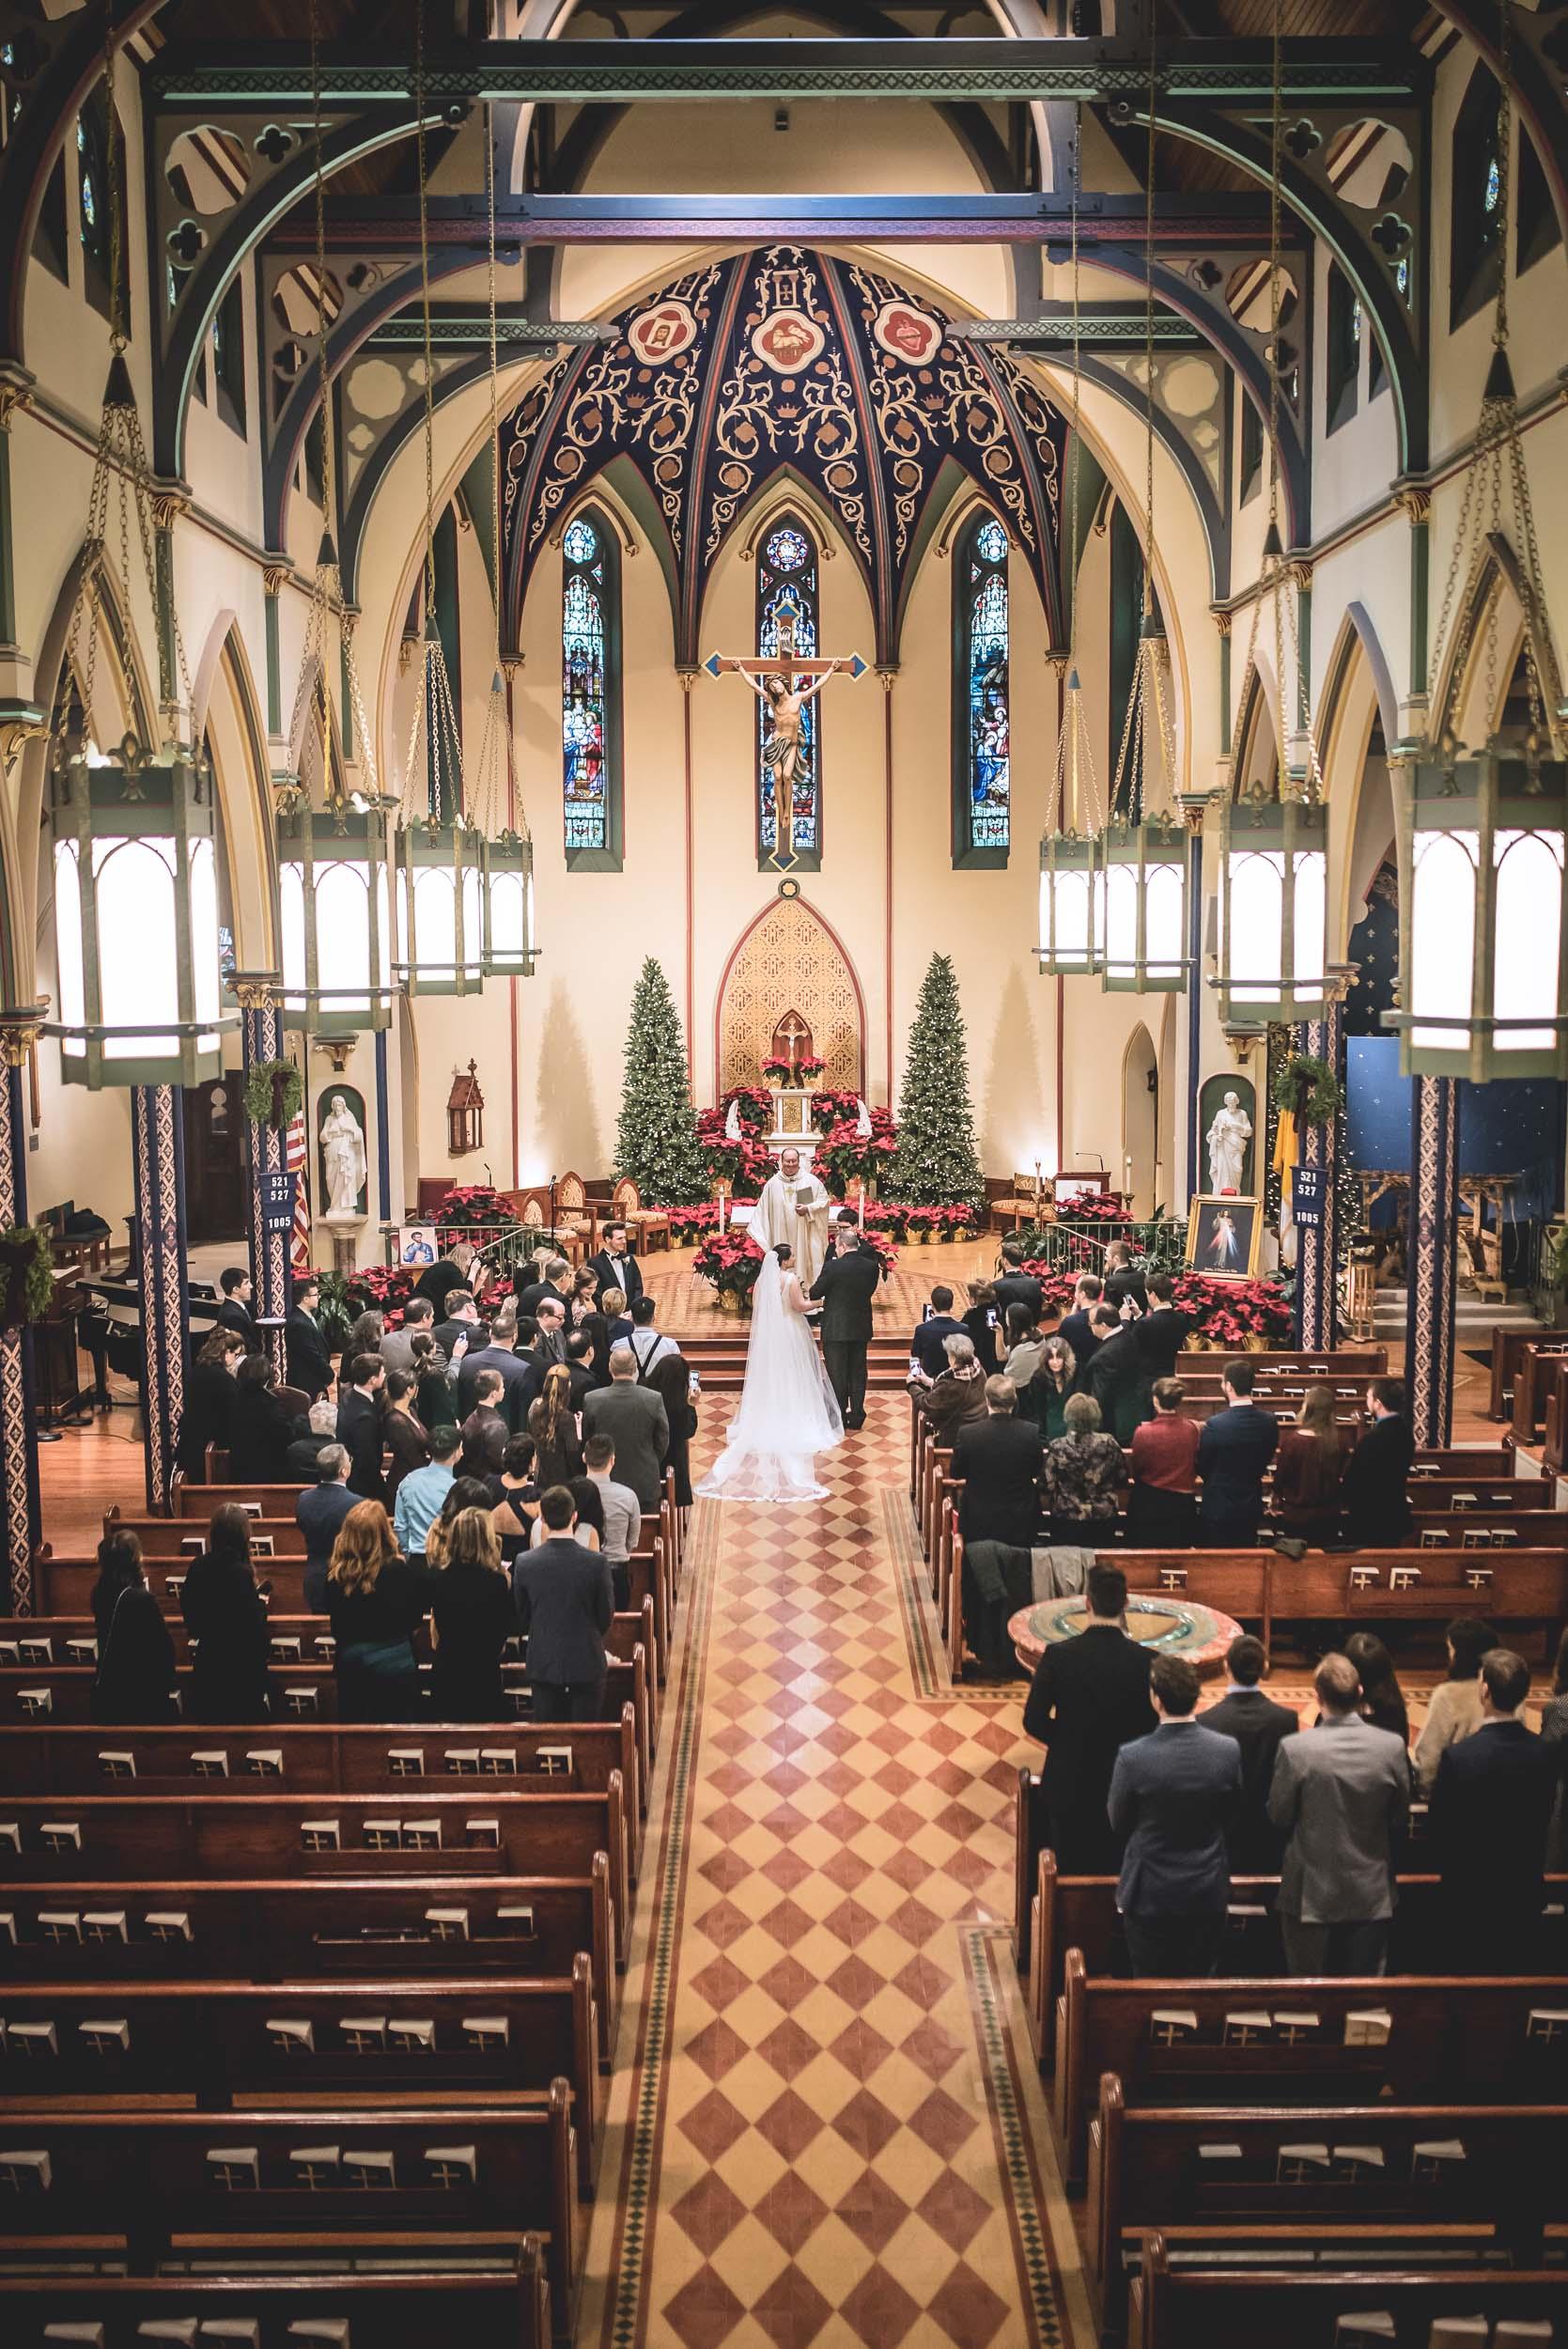 katie_mathia_wedding_Church_assumption_madison_hotel_morristown_new_jersey(2of2).jpg